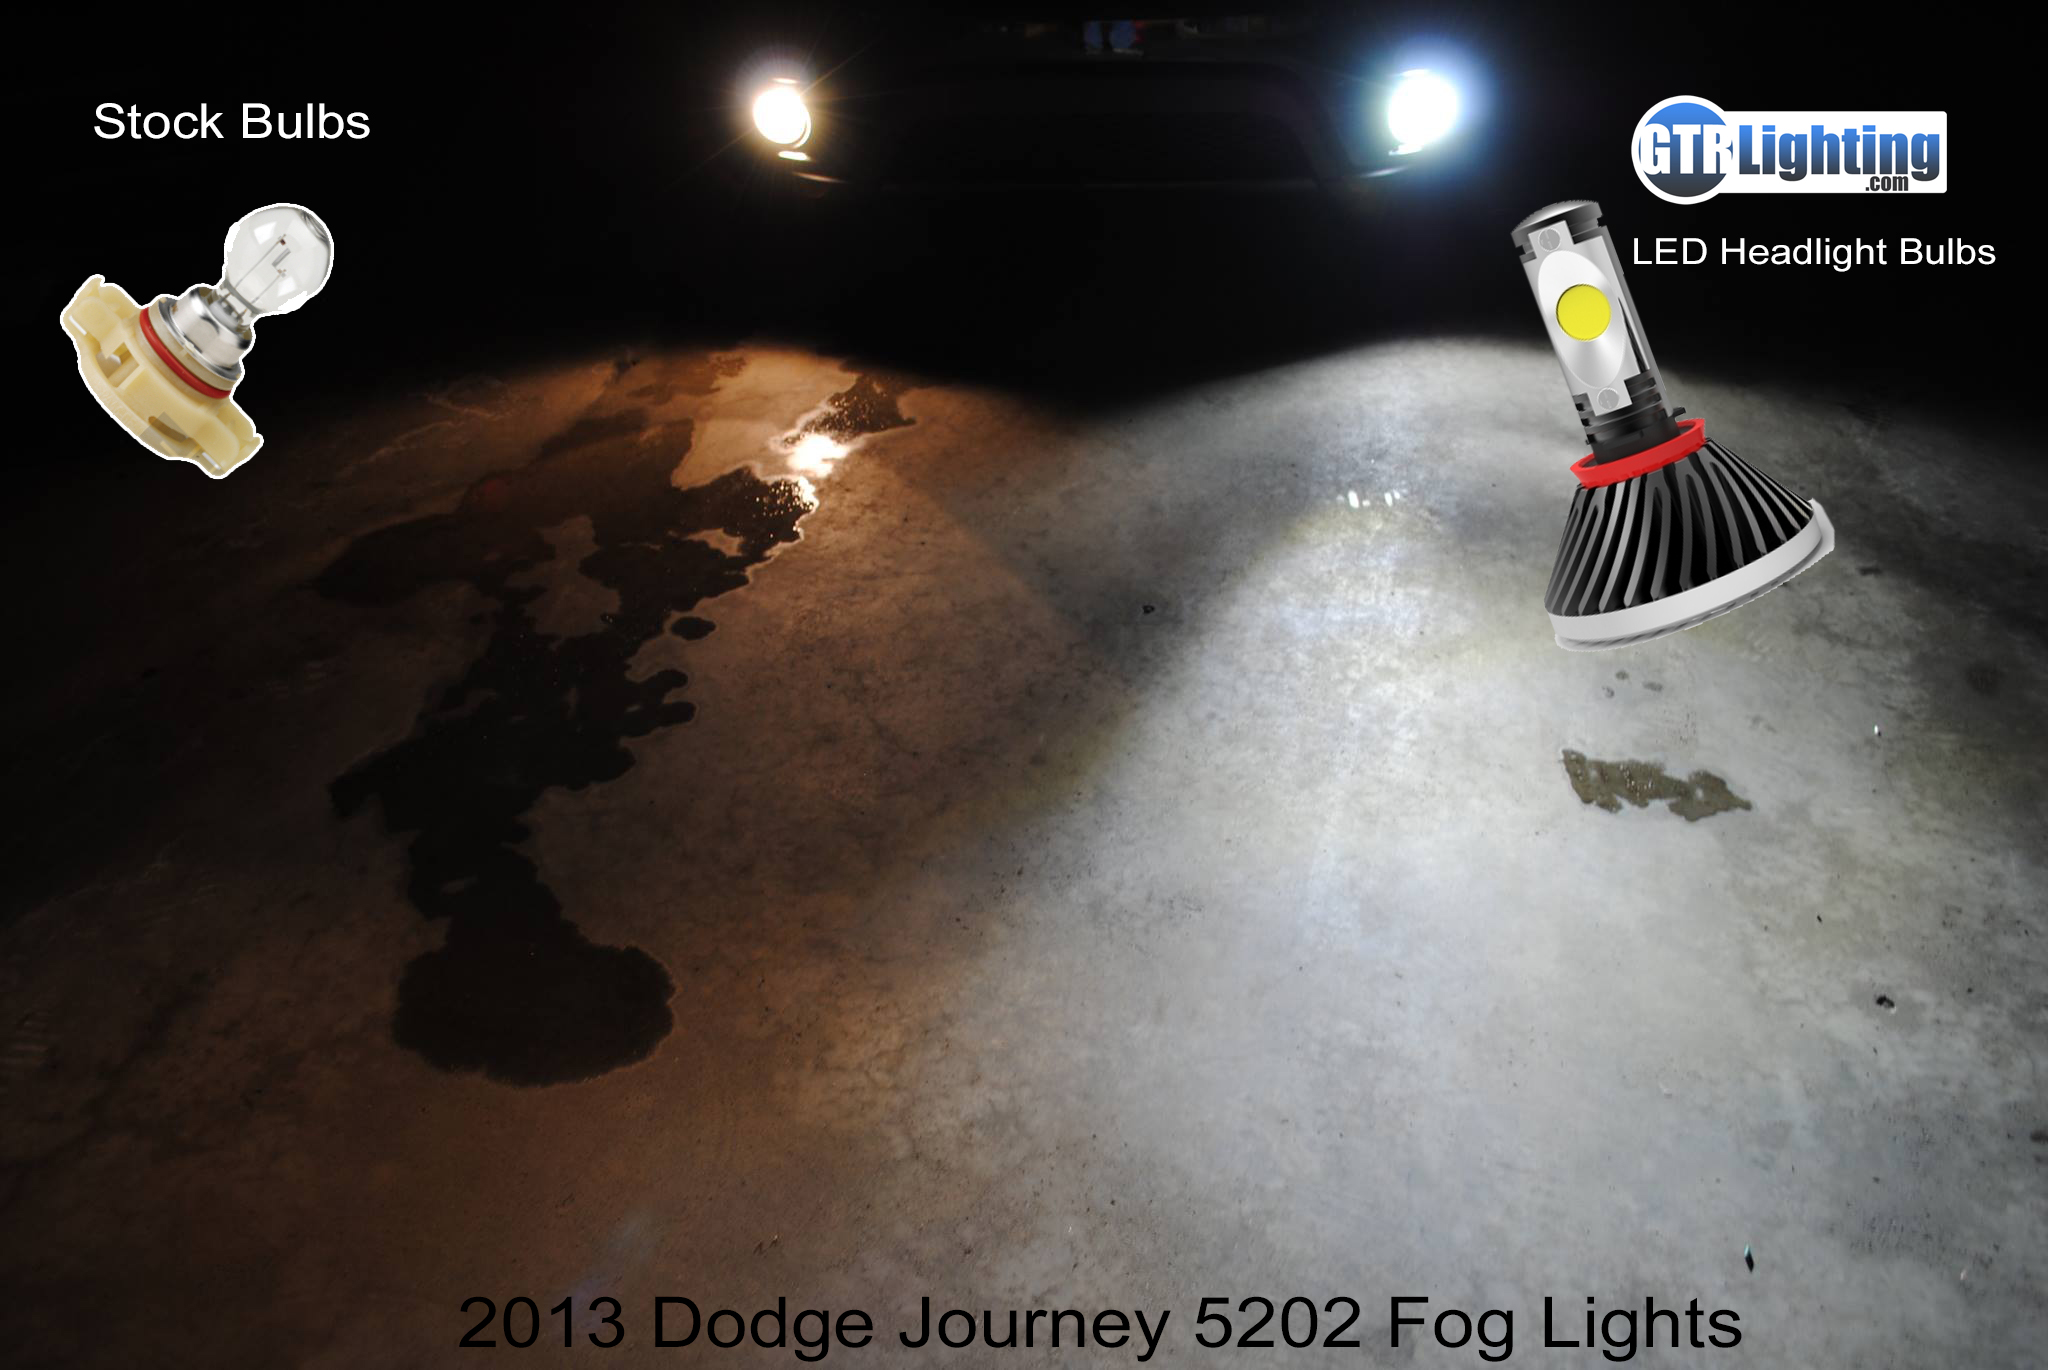 led-headlight-journey-fogs